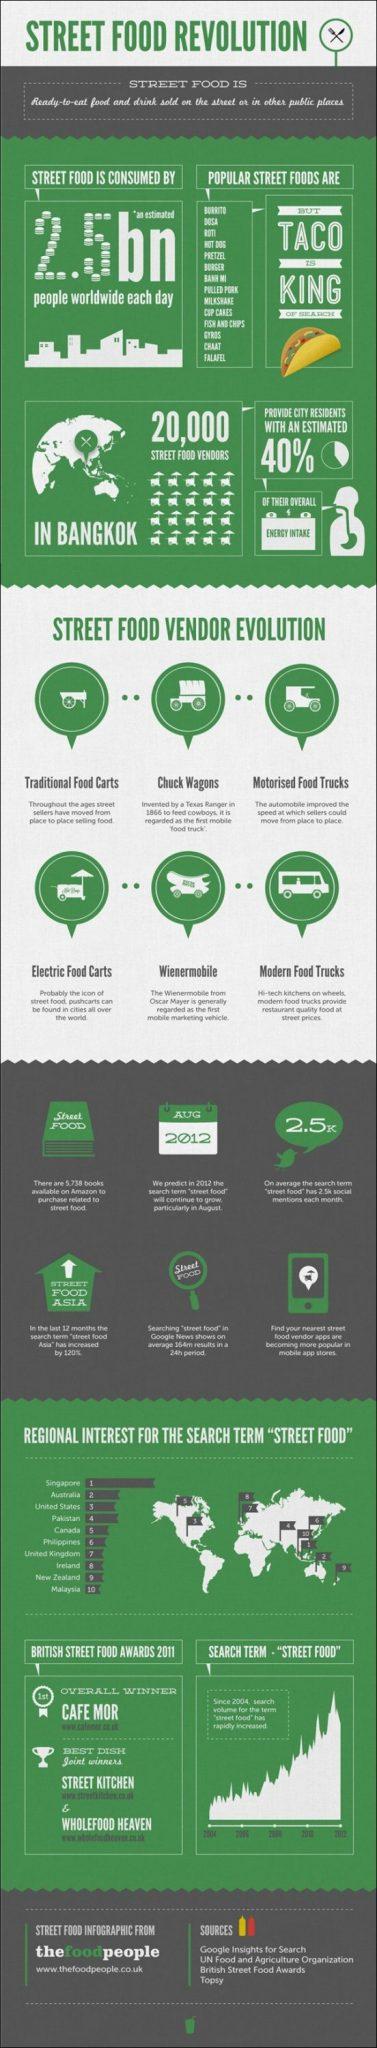 Street-Food-Revolution